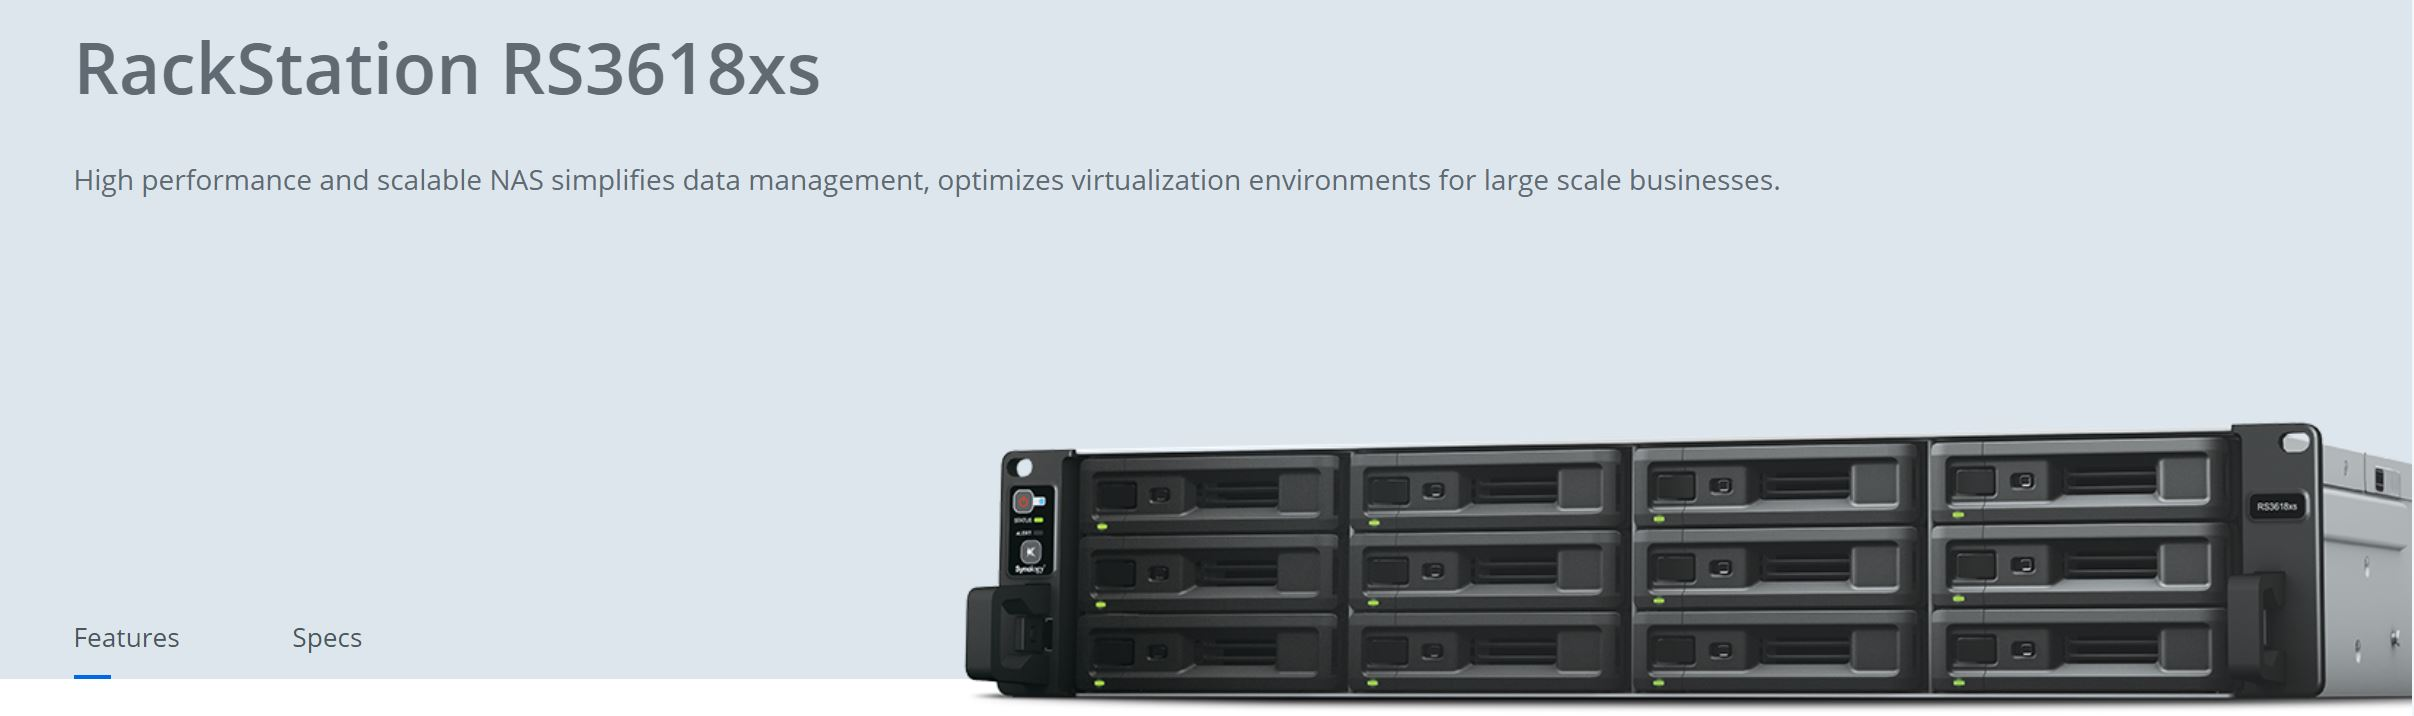 Synology RackStation RS3618xs 12-Bay 3.5' Diskless 4xGbE NAS (2U Rack), Intel Xeon D-1521 quad-core, 8GB RAM,2 x USB3.0, Scalable- with SRS